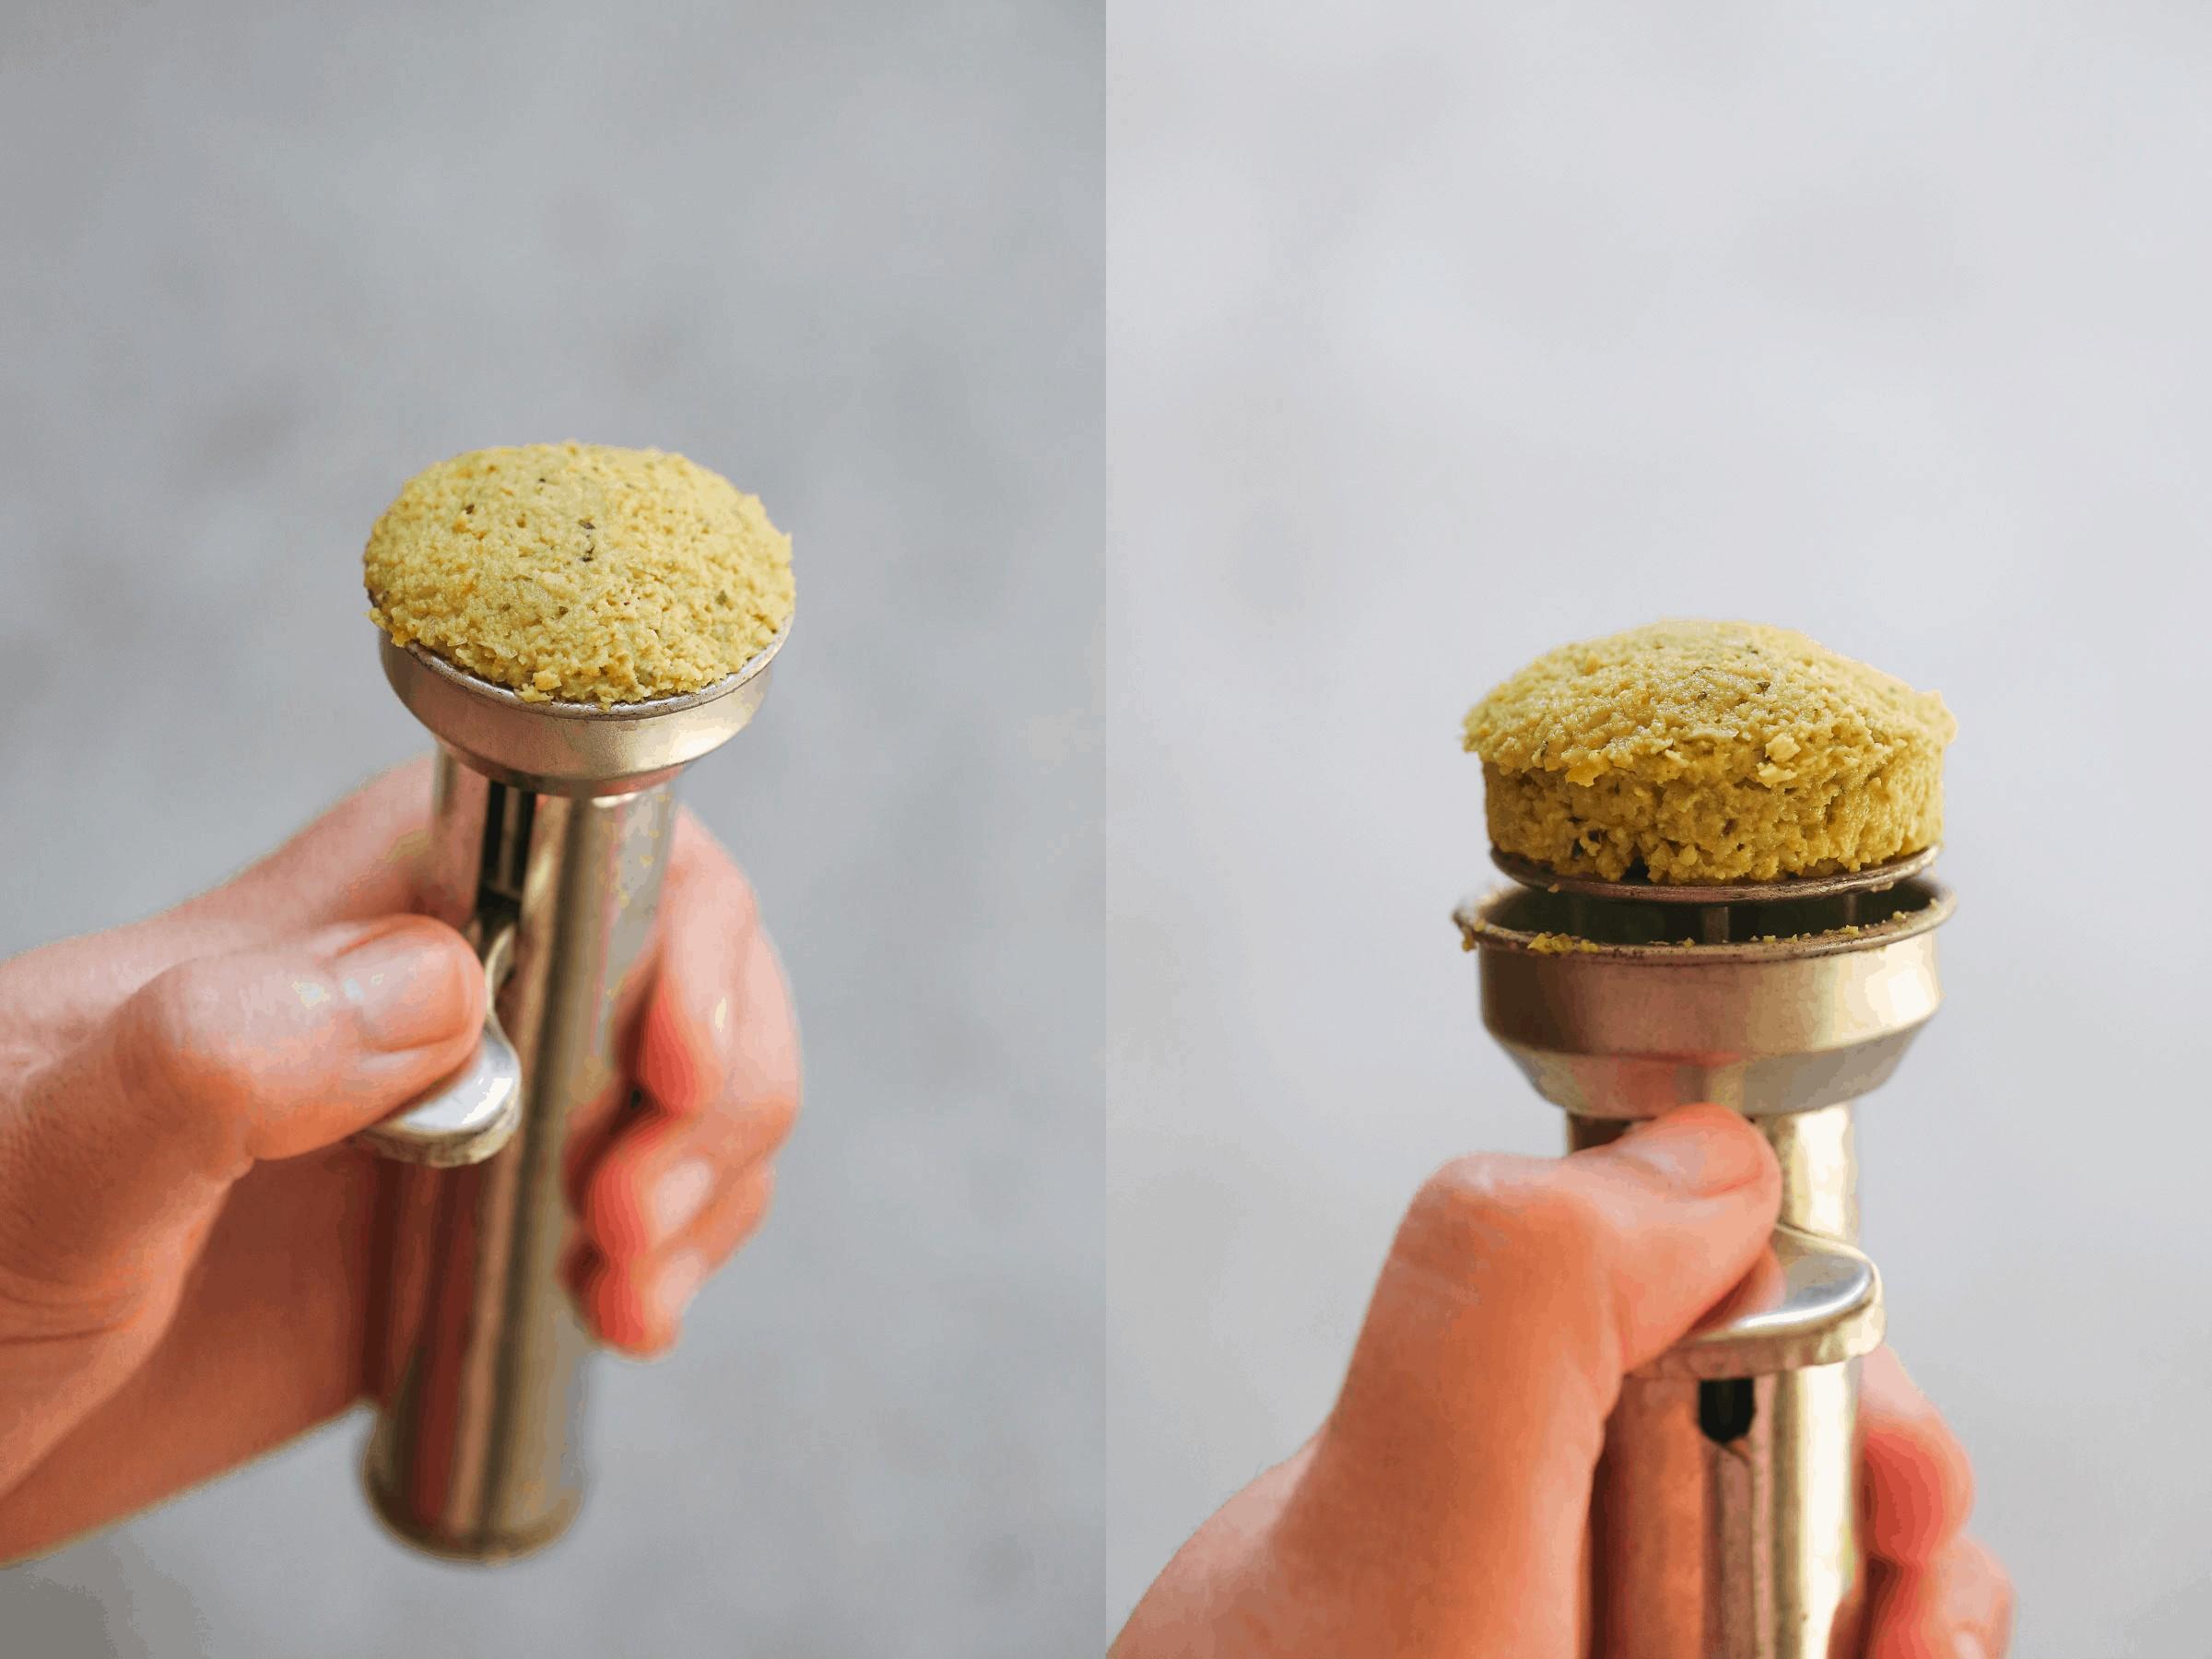 A traditional falafel scoop with falafel mixture